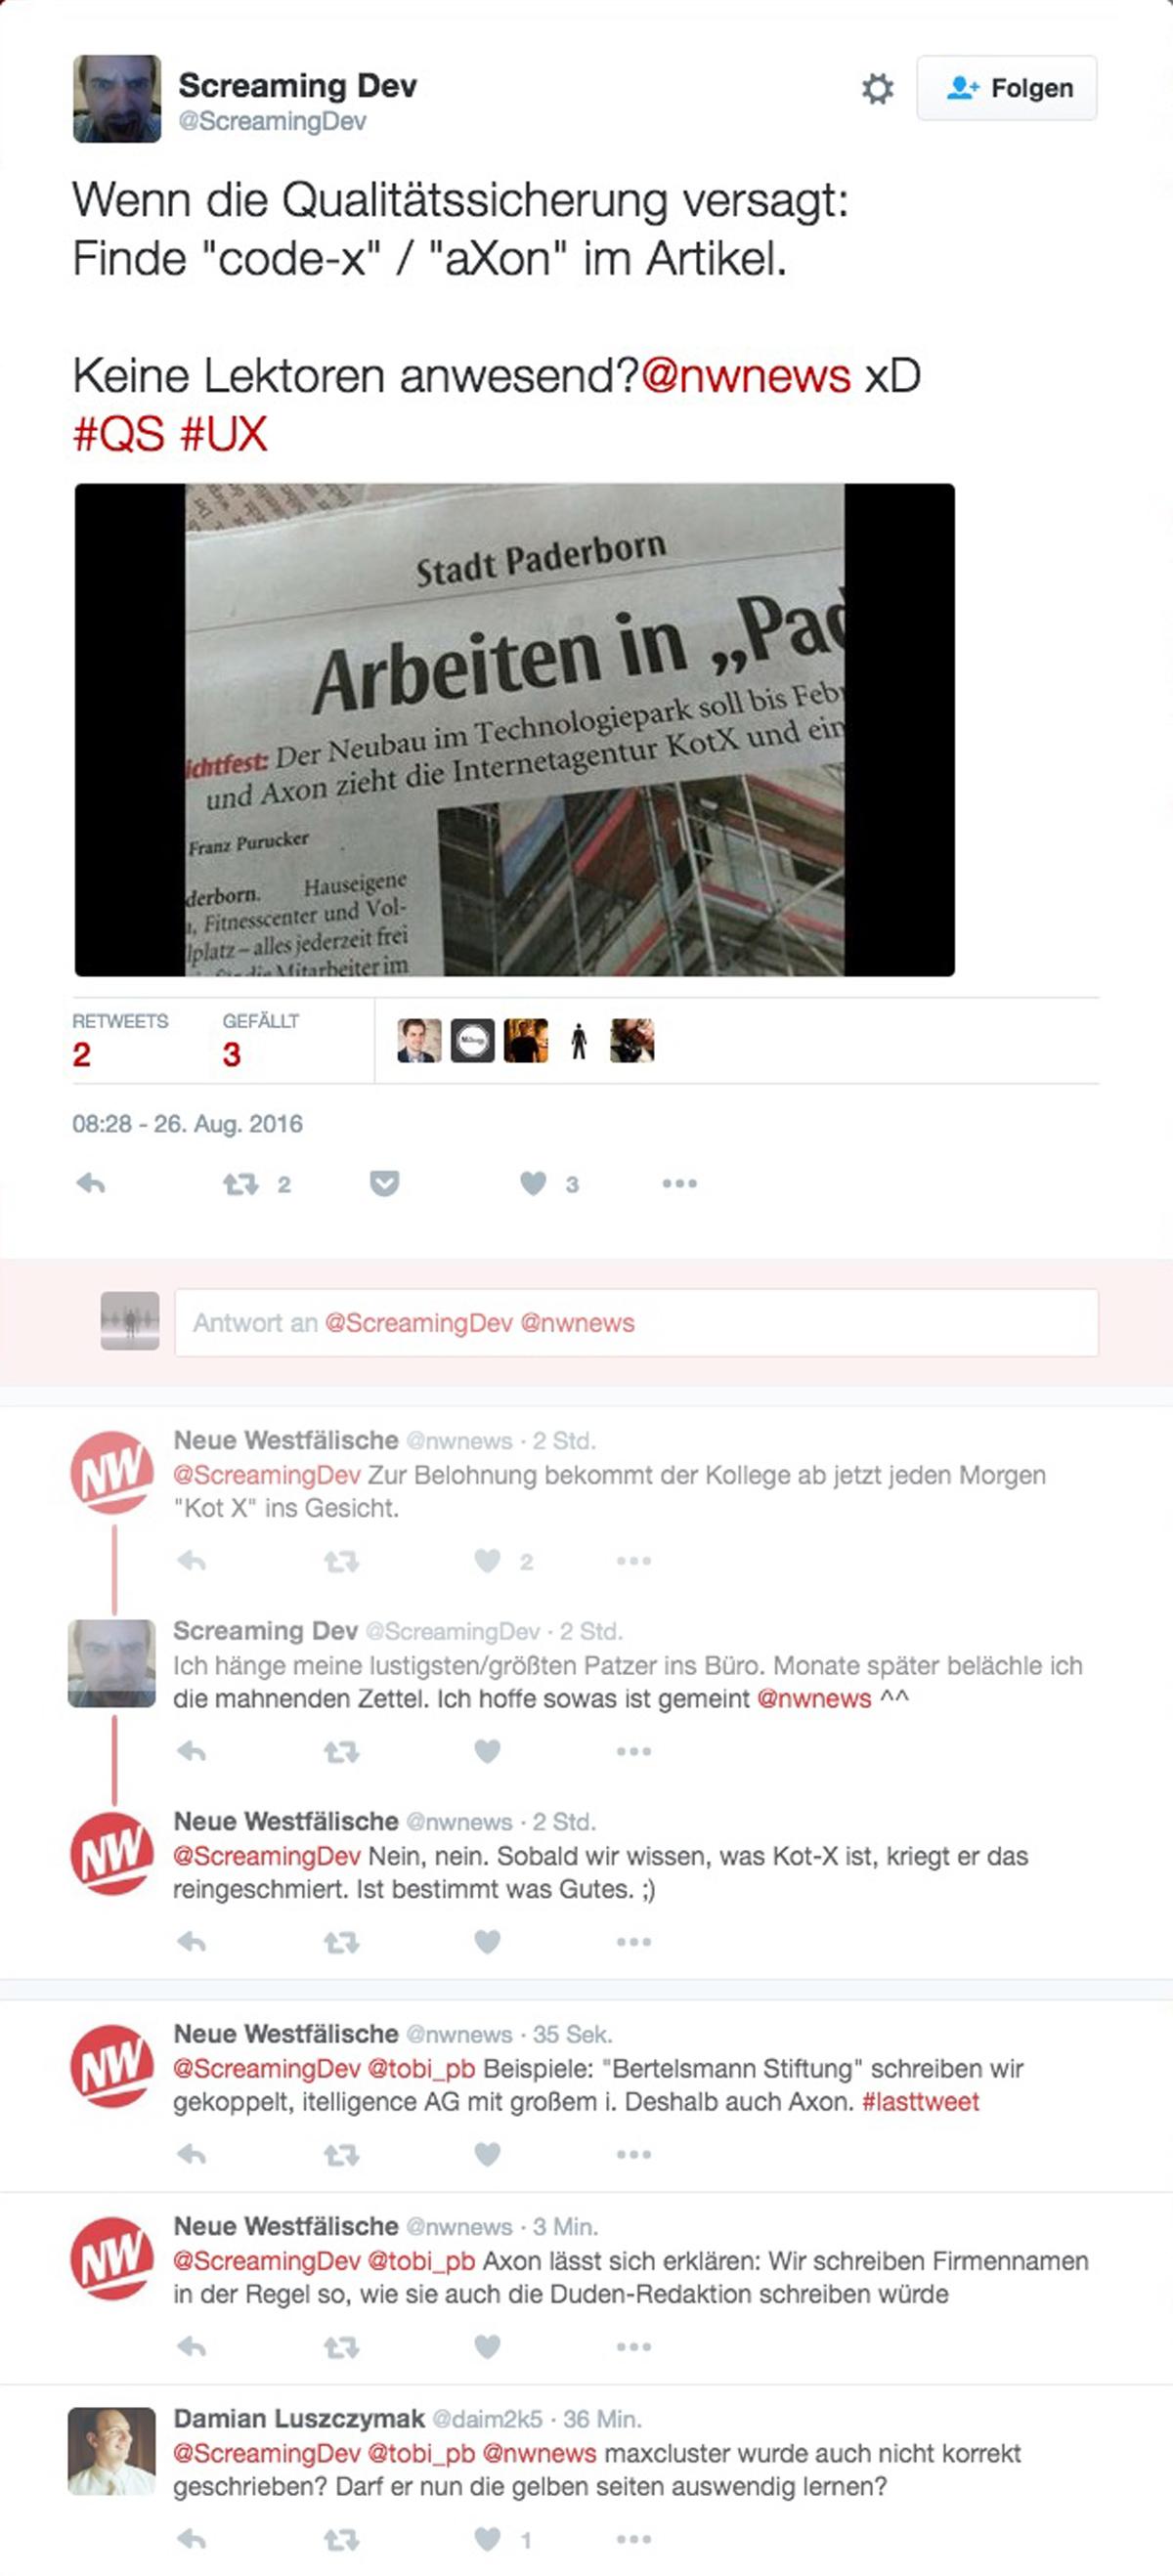 Qualitätsjournalismus aus Paderborn?